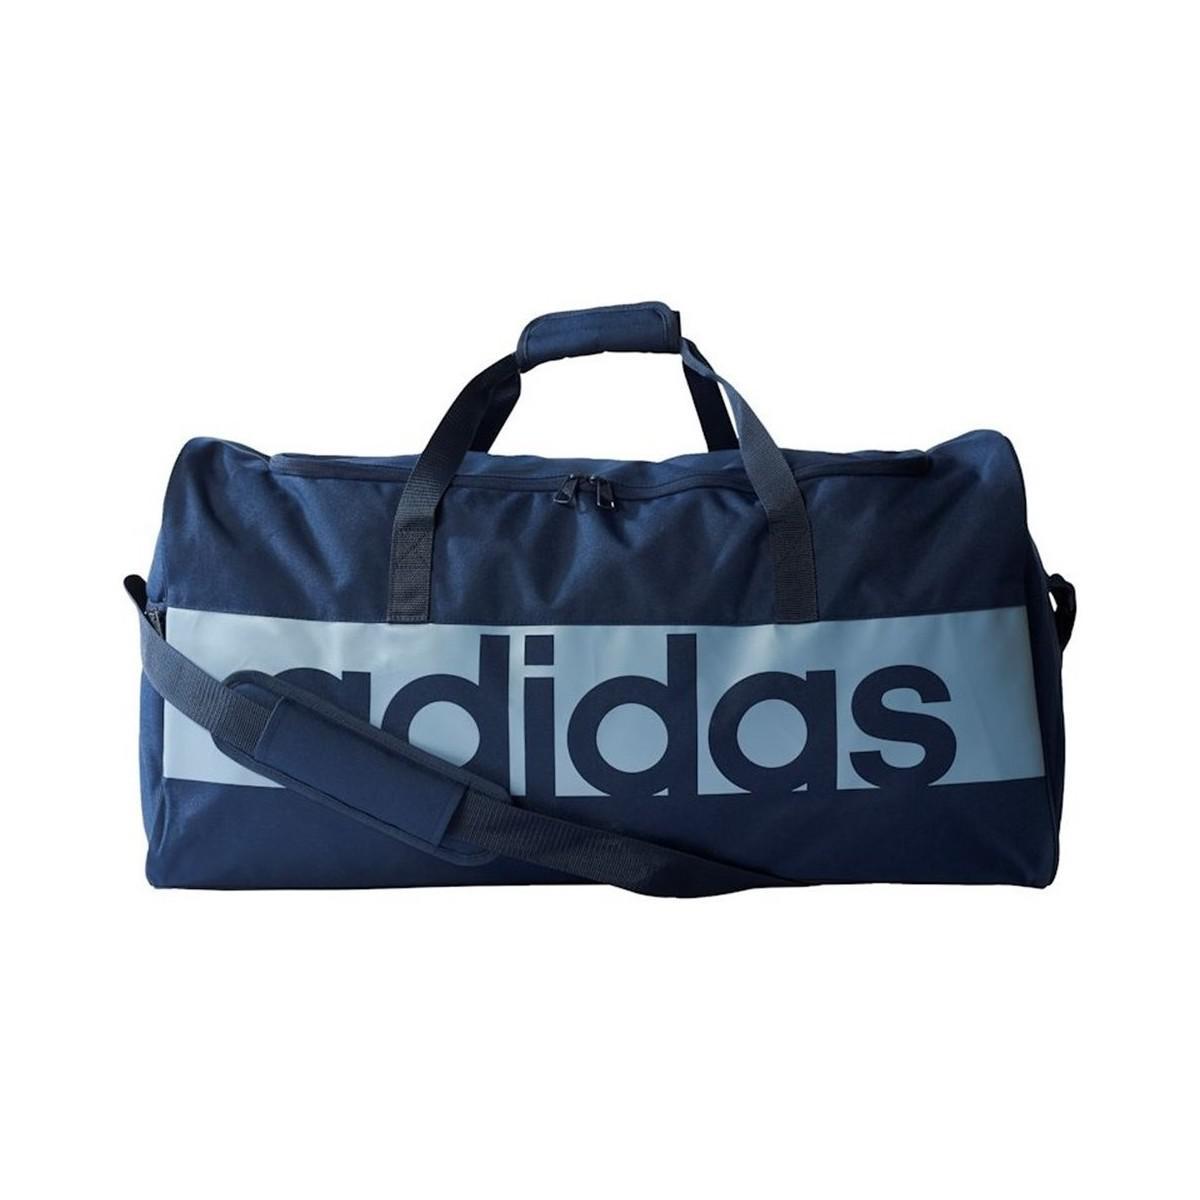 09b3f082784c Adidas Lin Per Tb L Women s Sports Bag In Multicolour in Blue for ...